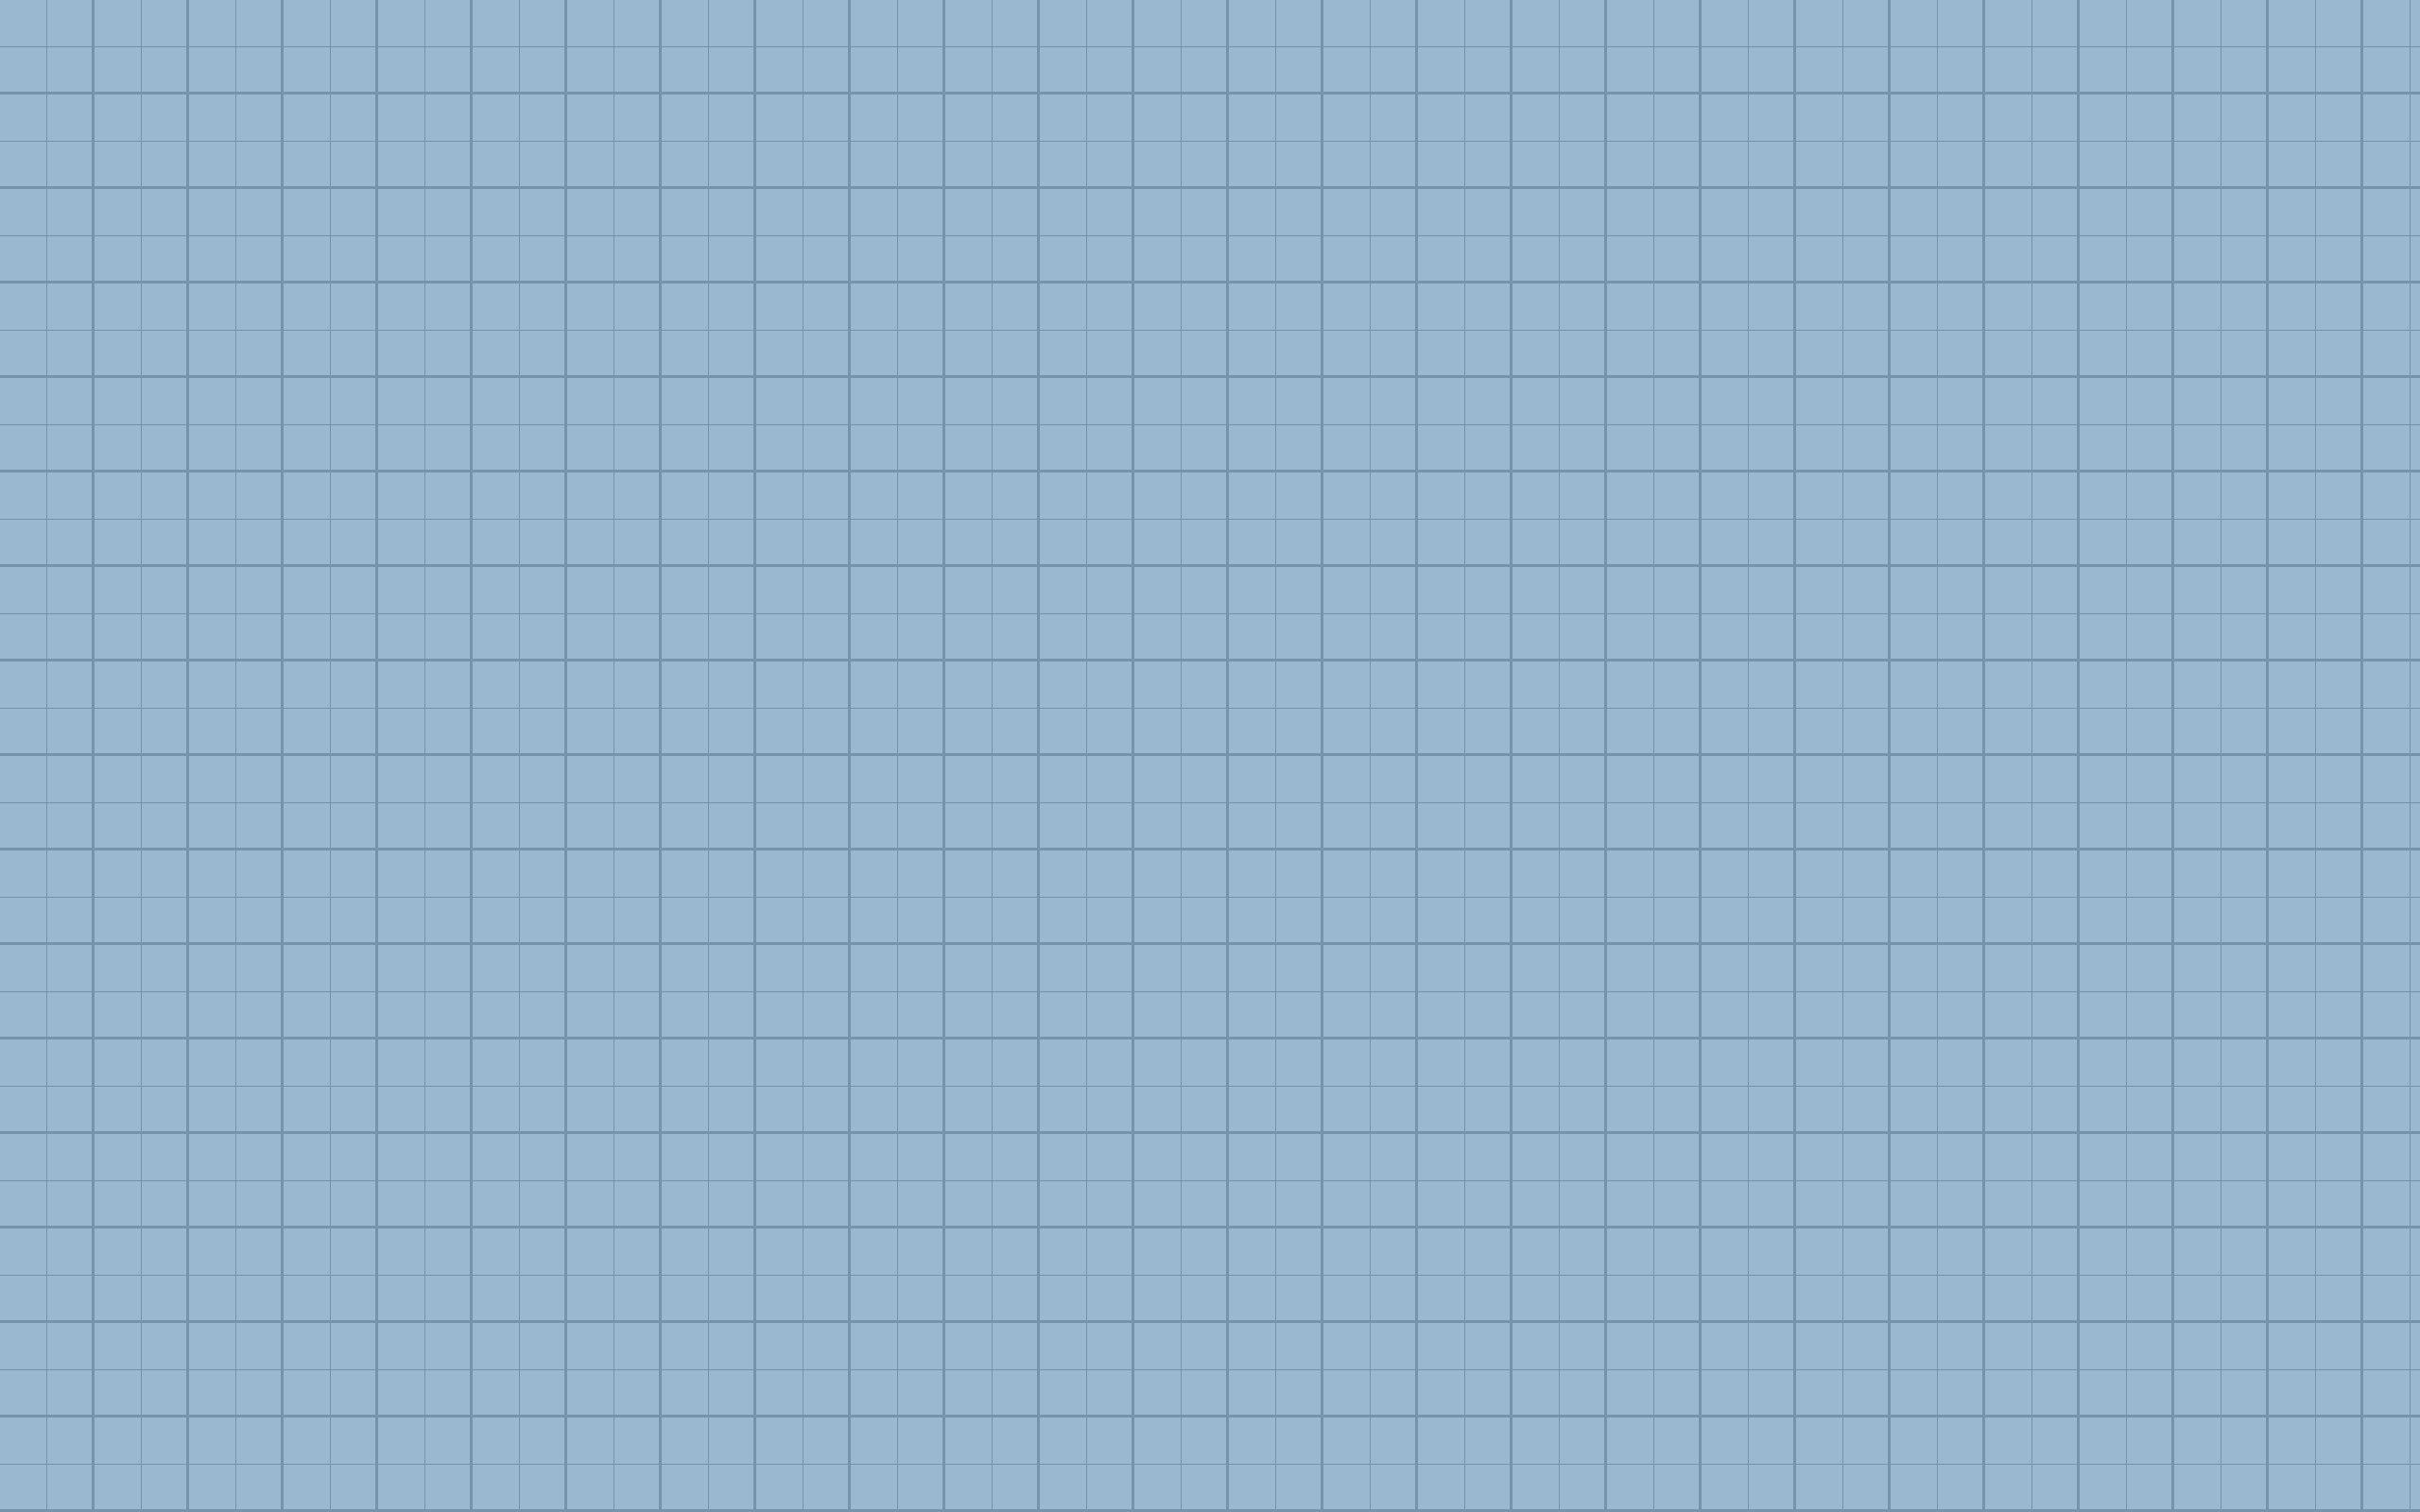 Aesthetic Grid Laptop Wallpapers Top Free Aesthetic Grid Laptop Backgrounds Wallpaperaccess